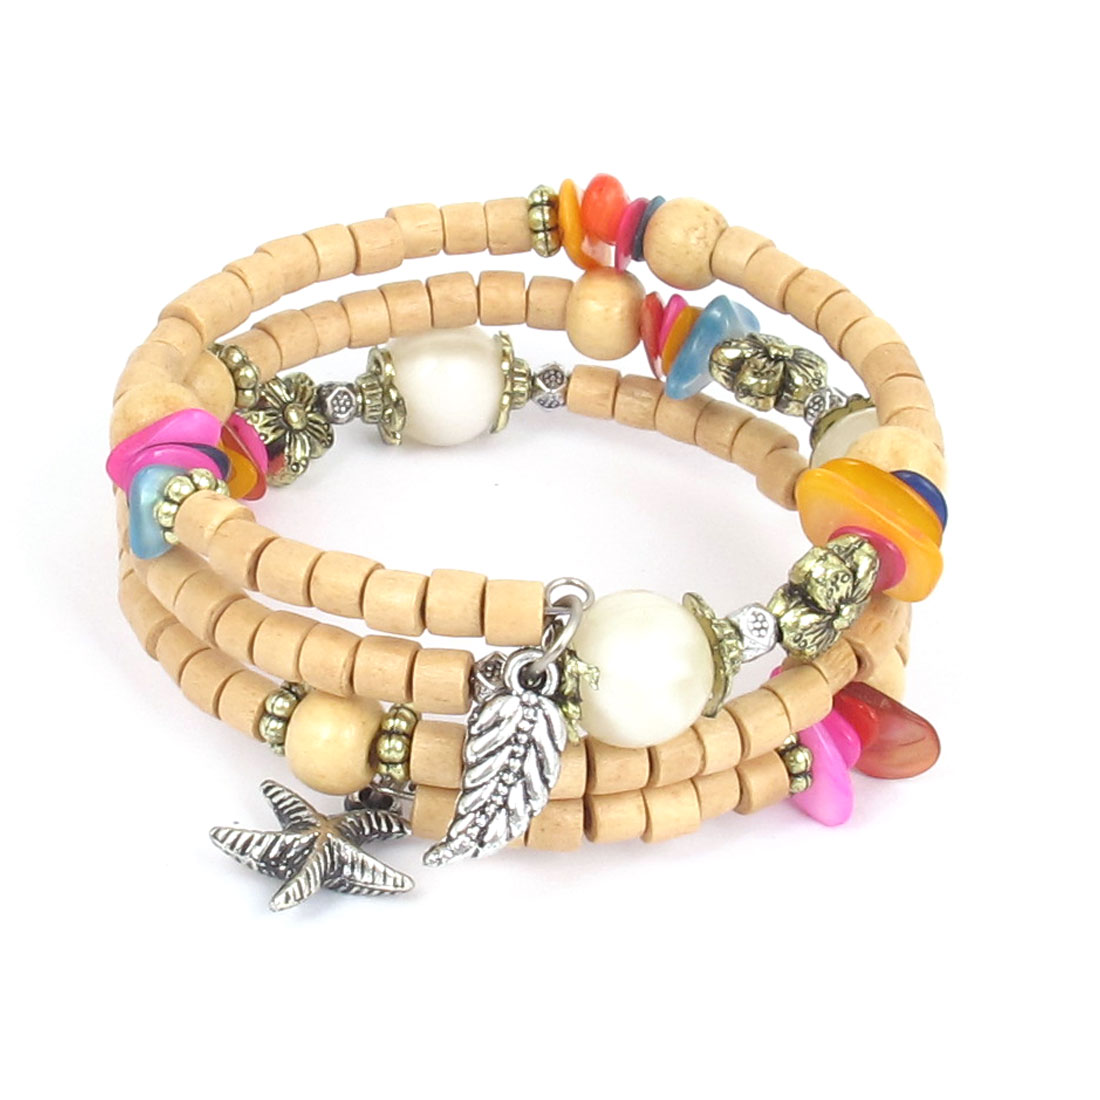 Women Handmade National Style Wooden Cylinder Beads Flower Decor 3-layer Bangle Bracelet Beige